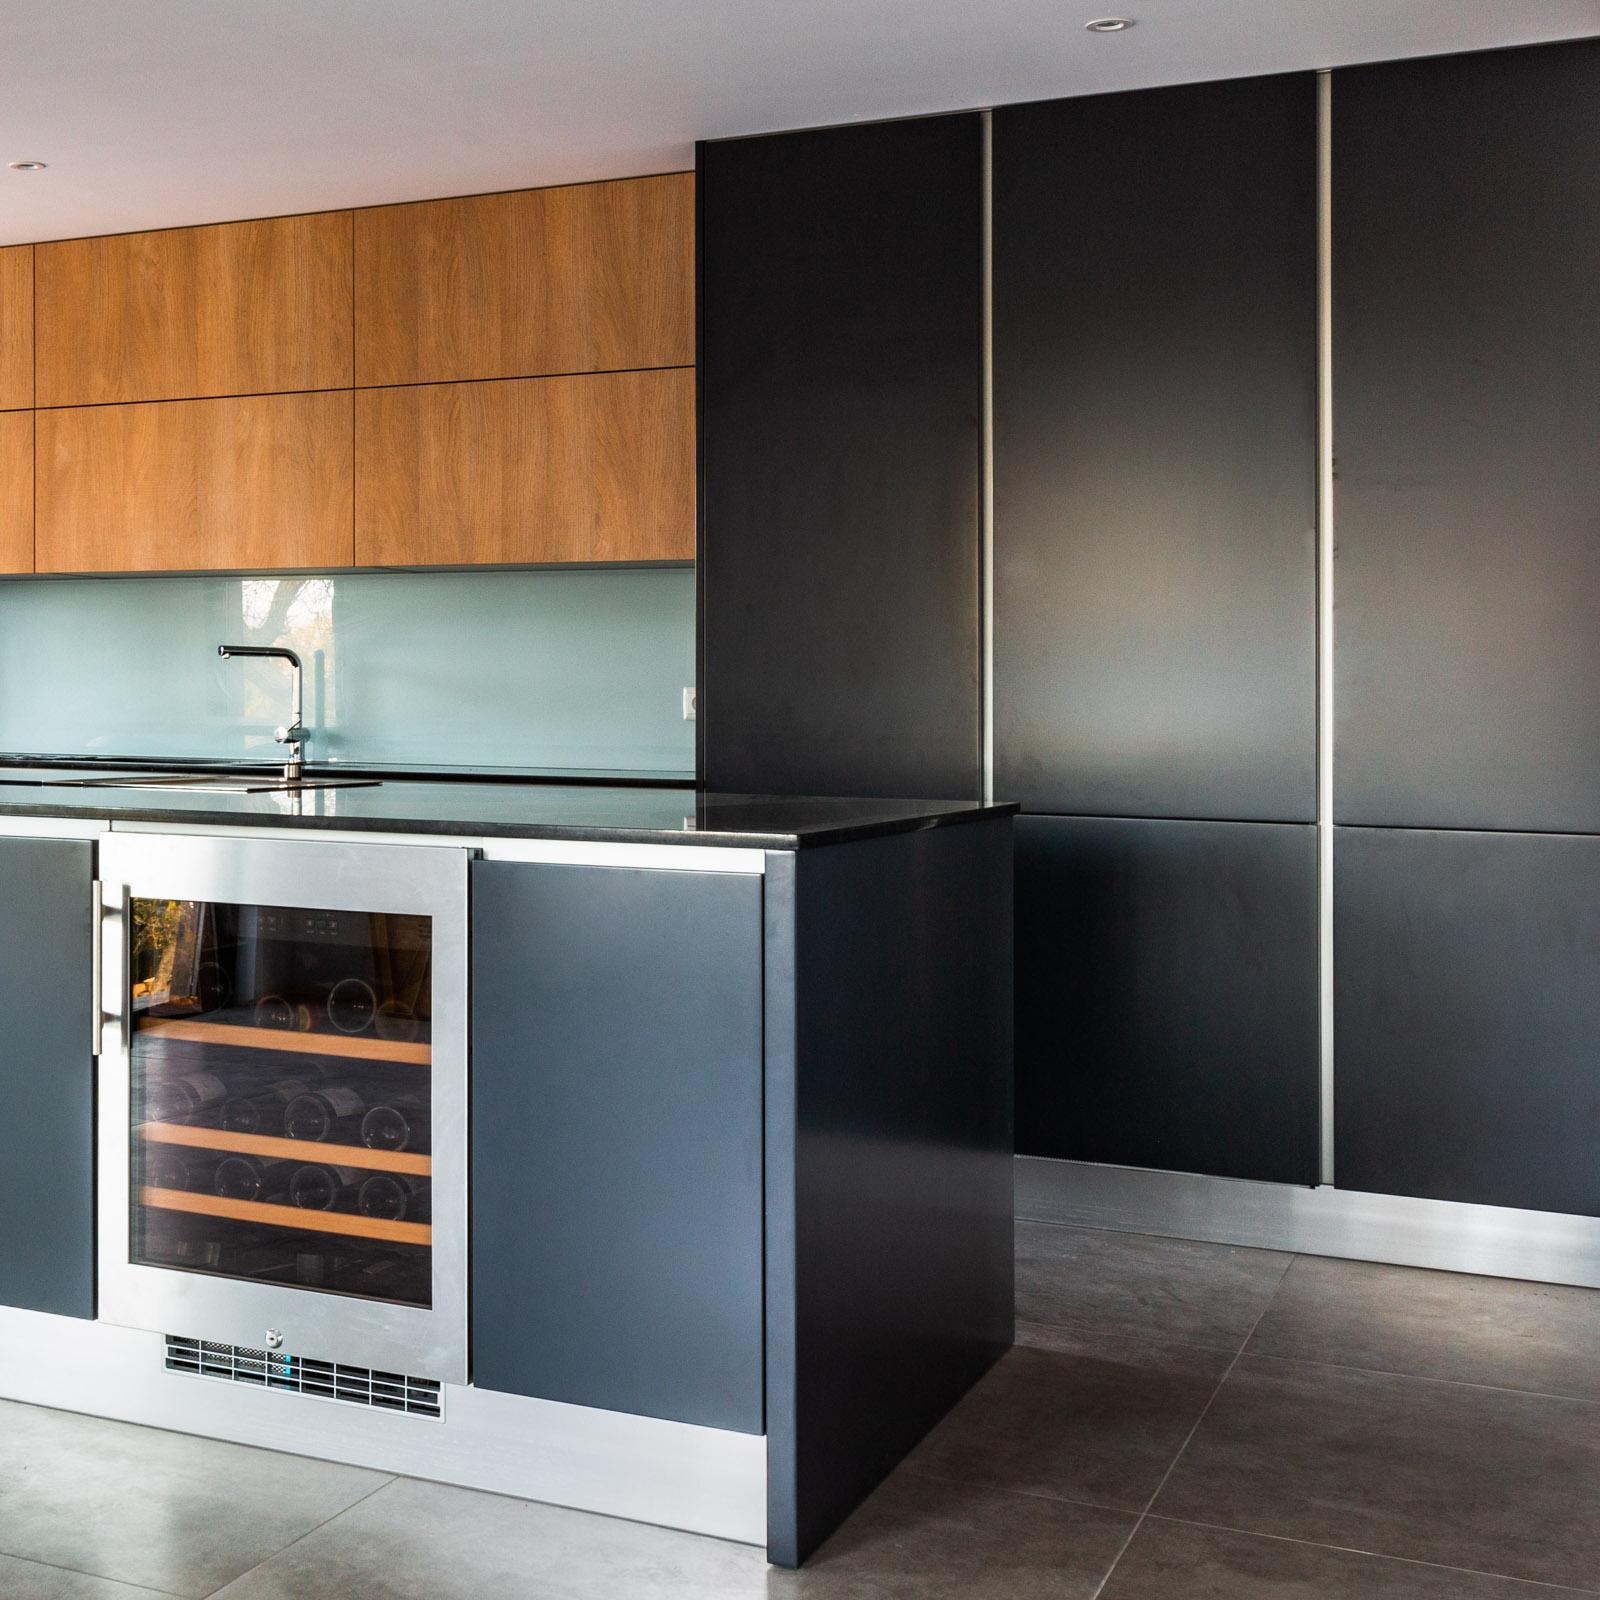 Built-in fridges in handleless kitchen